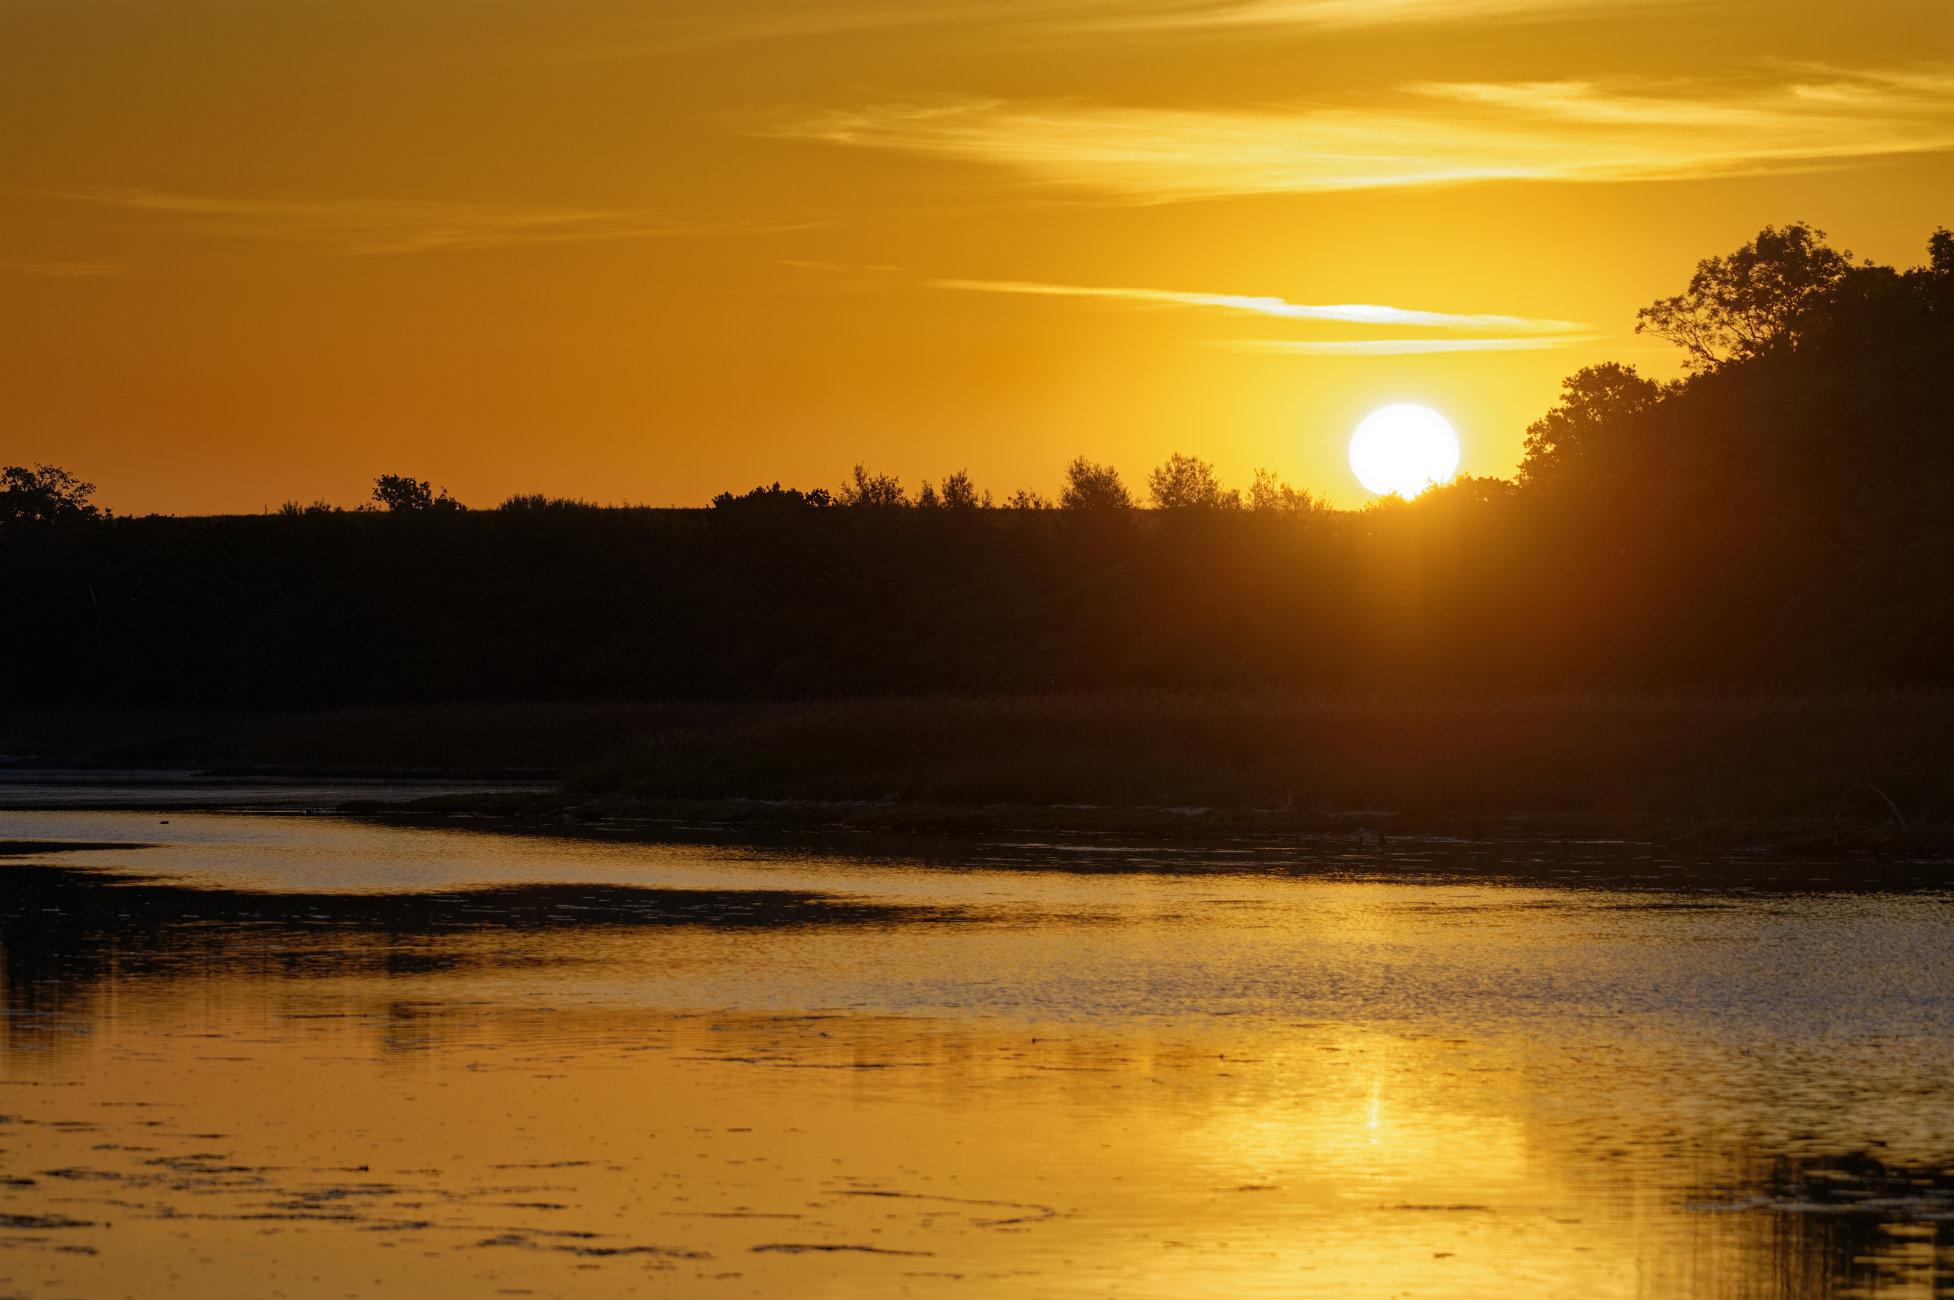 Sunrise on the river Yar.